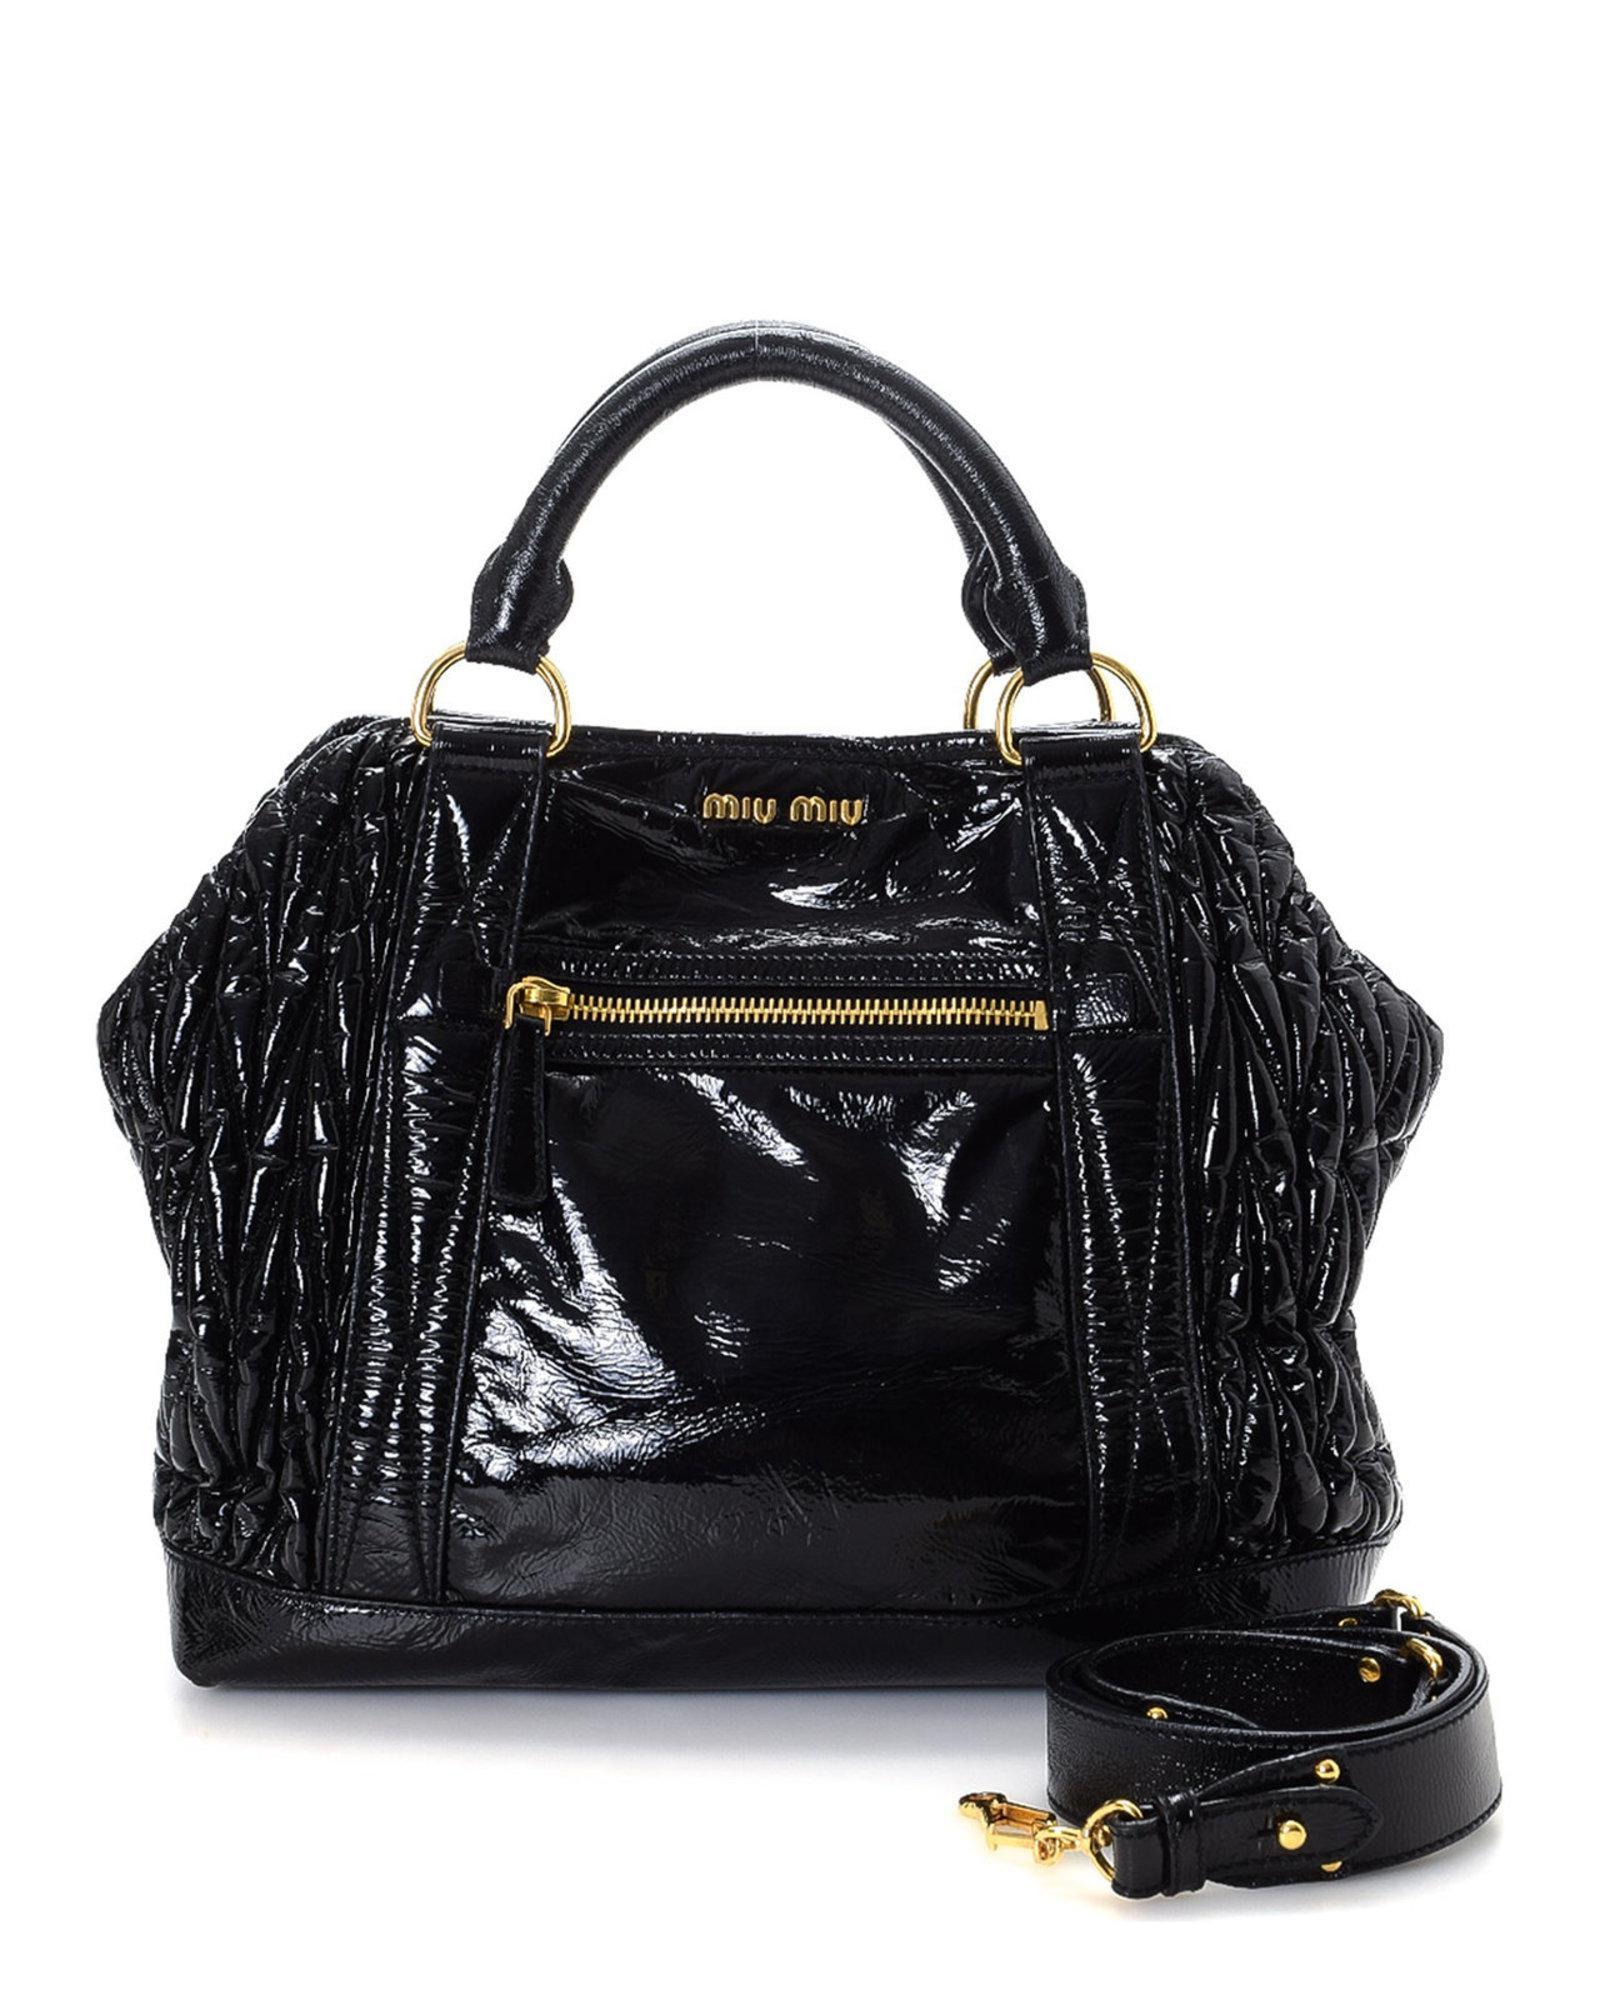 fc5d38a4f38b Lyst - Miu Miu Handbag - Vintage in Black